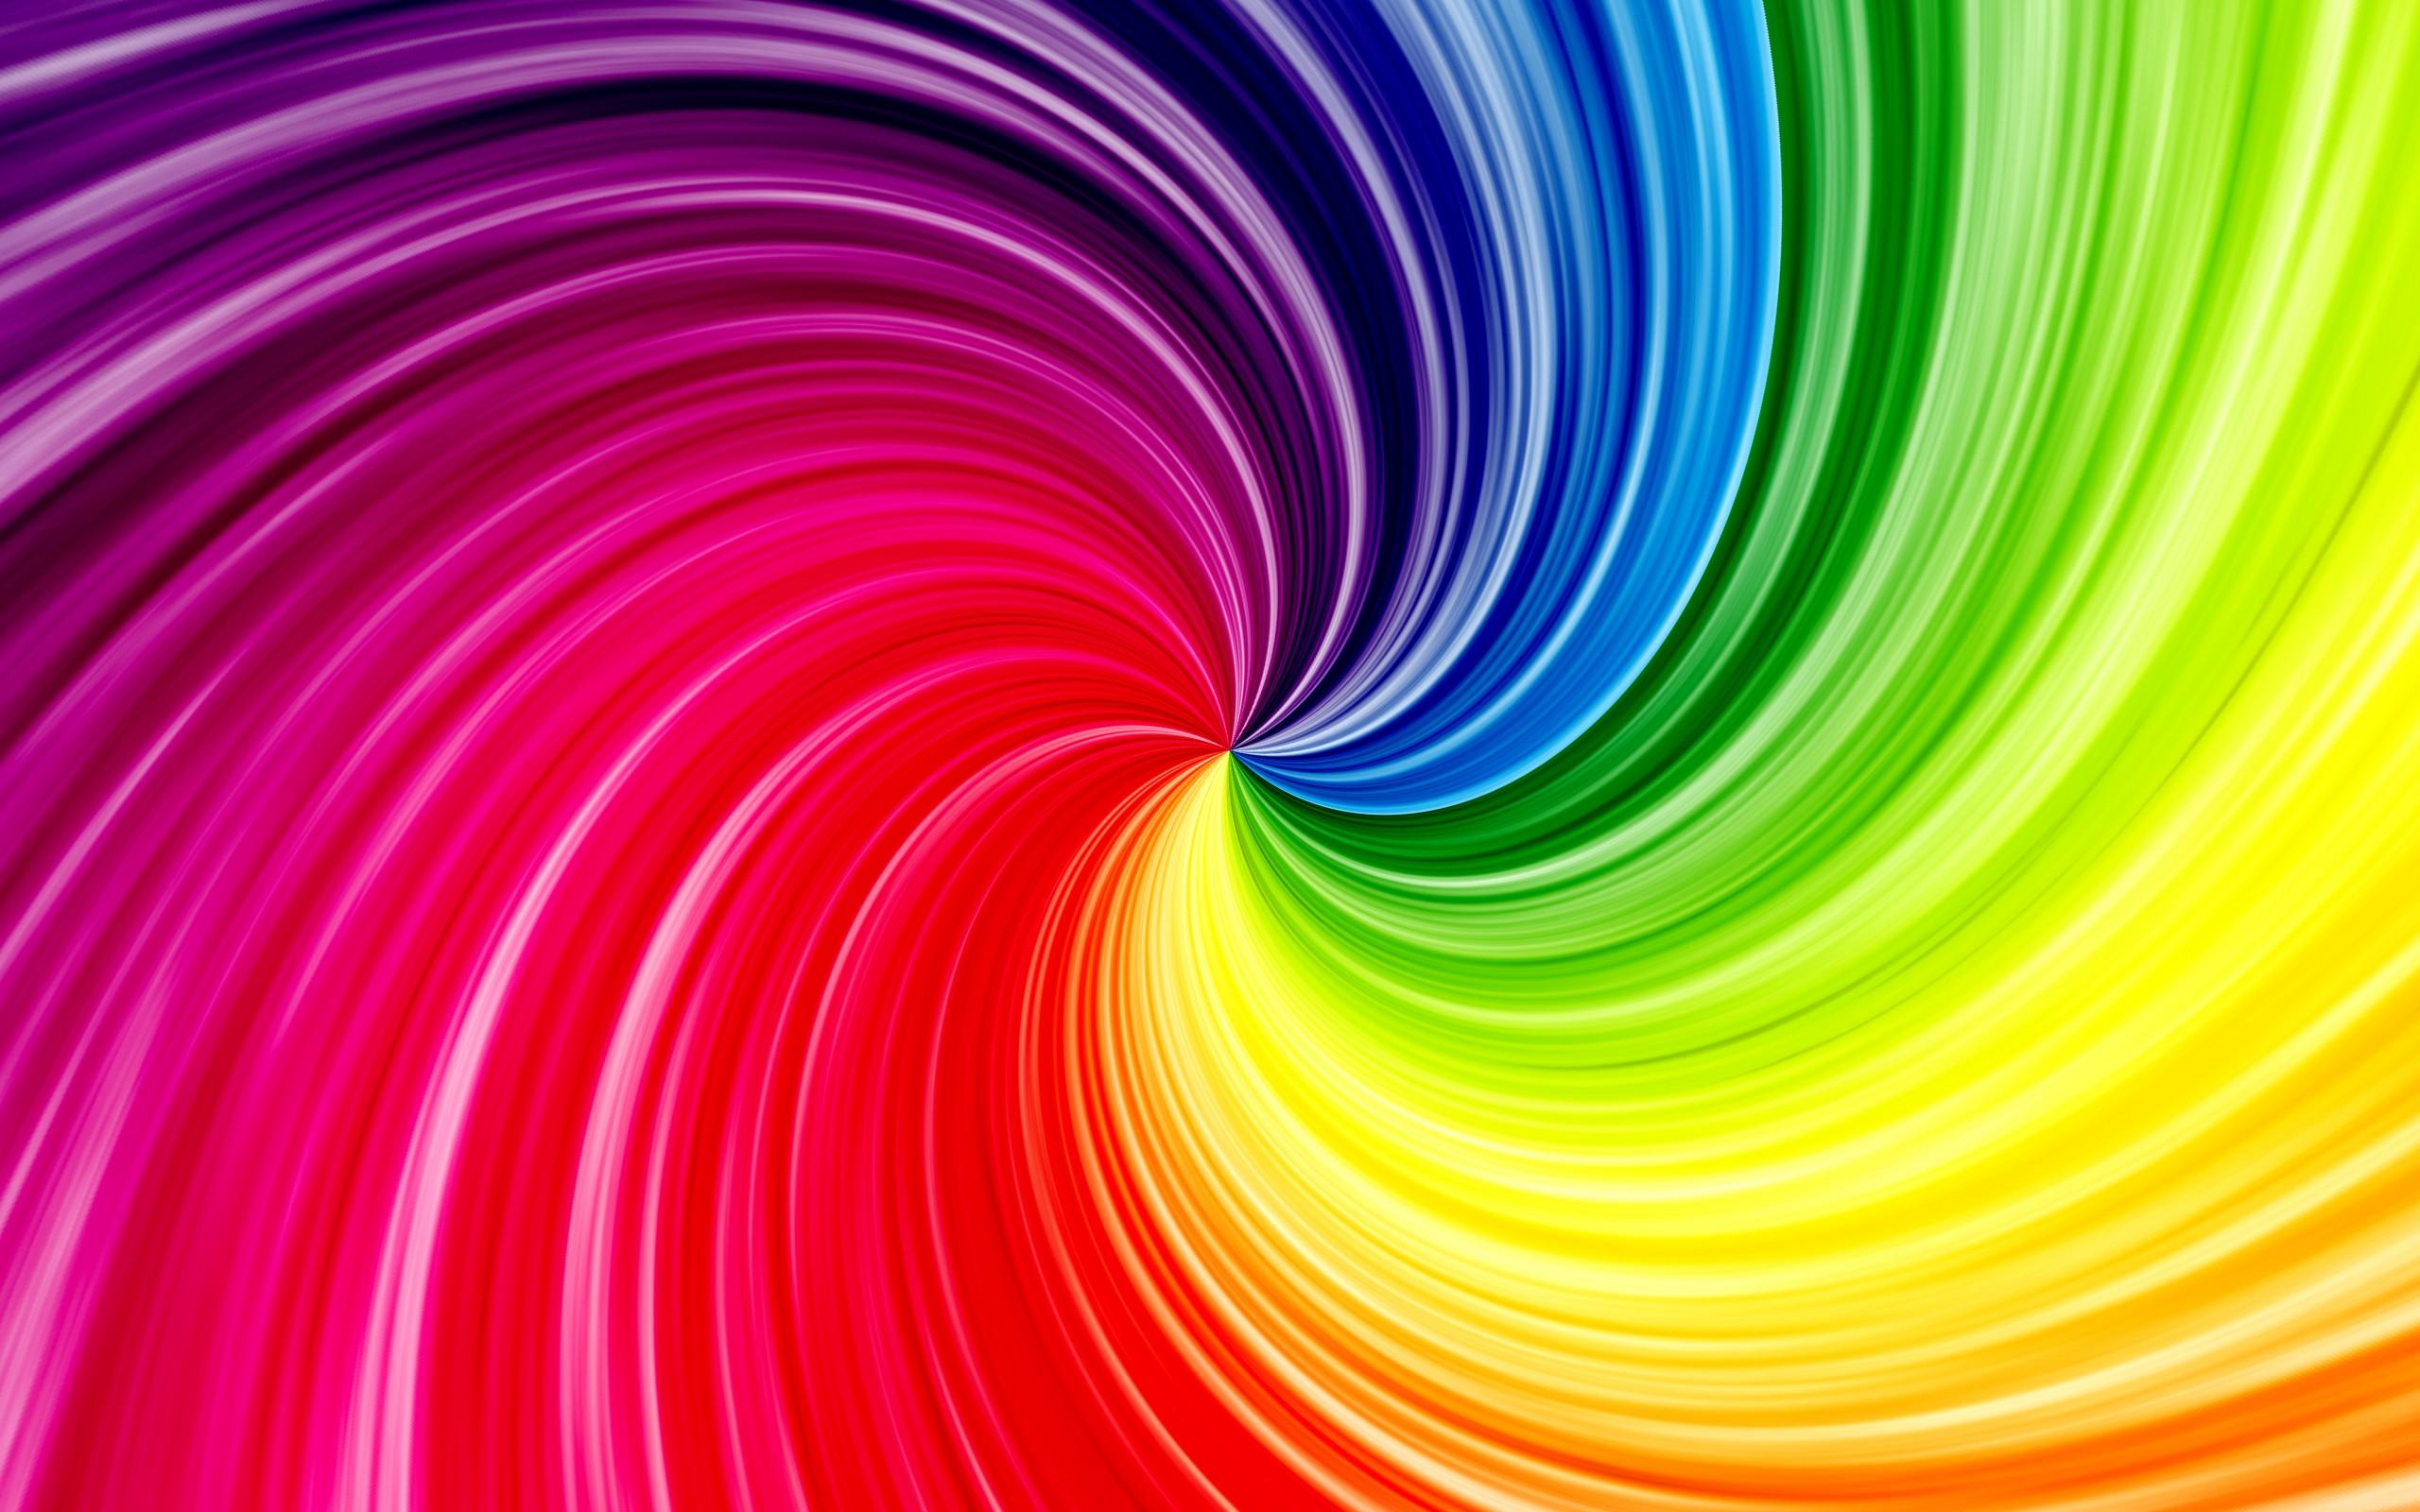 Farben full hd wallpaper and hintergrund 2560x1600 id for Gama de colores vivos